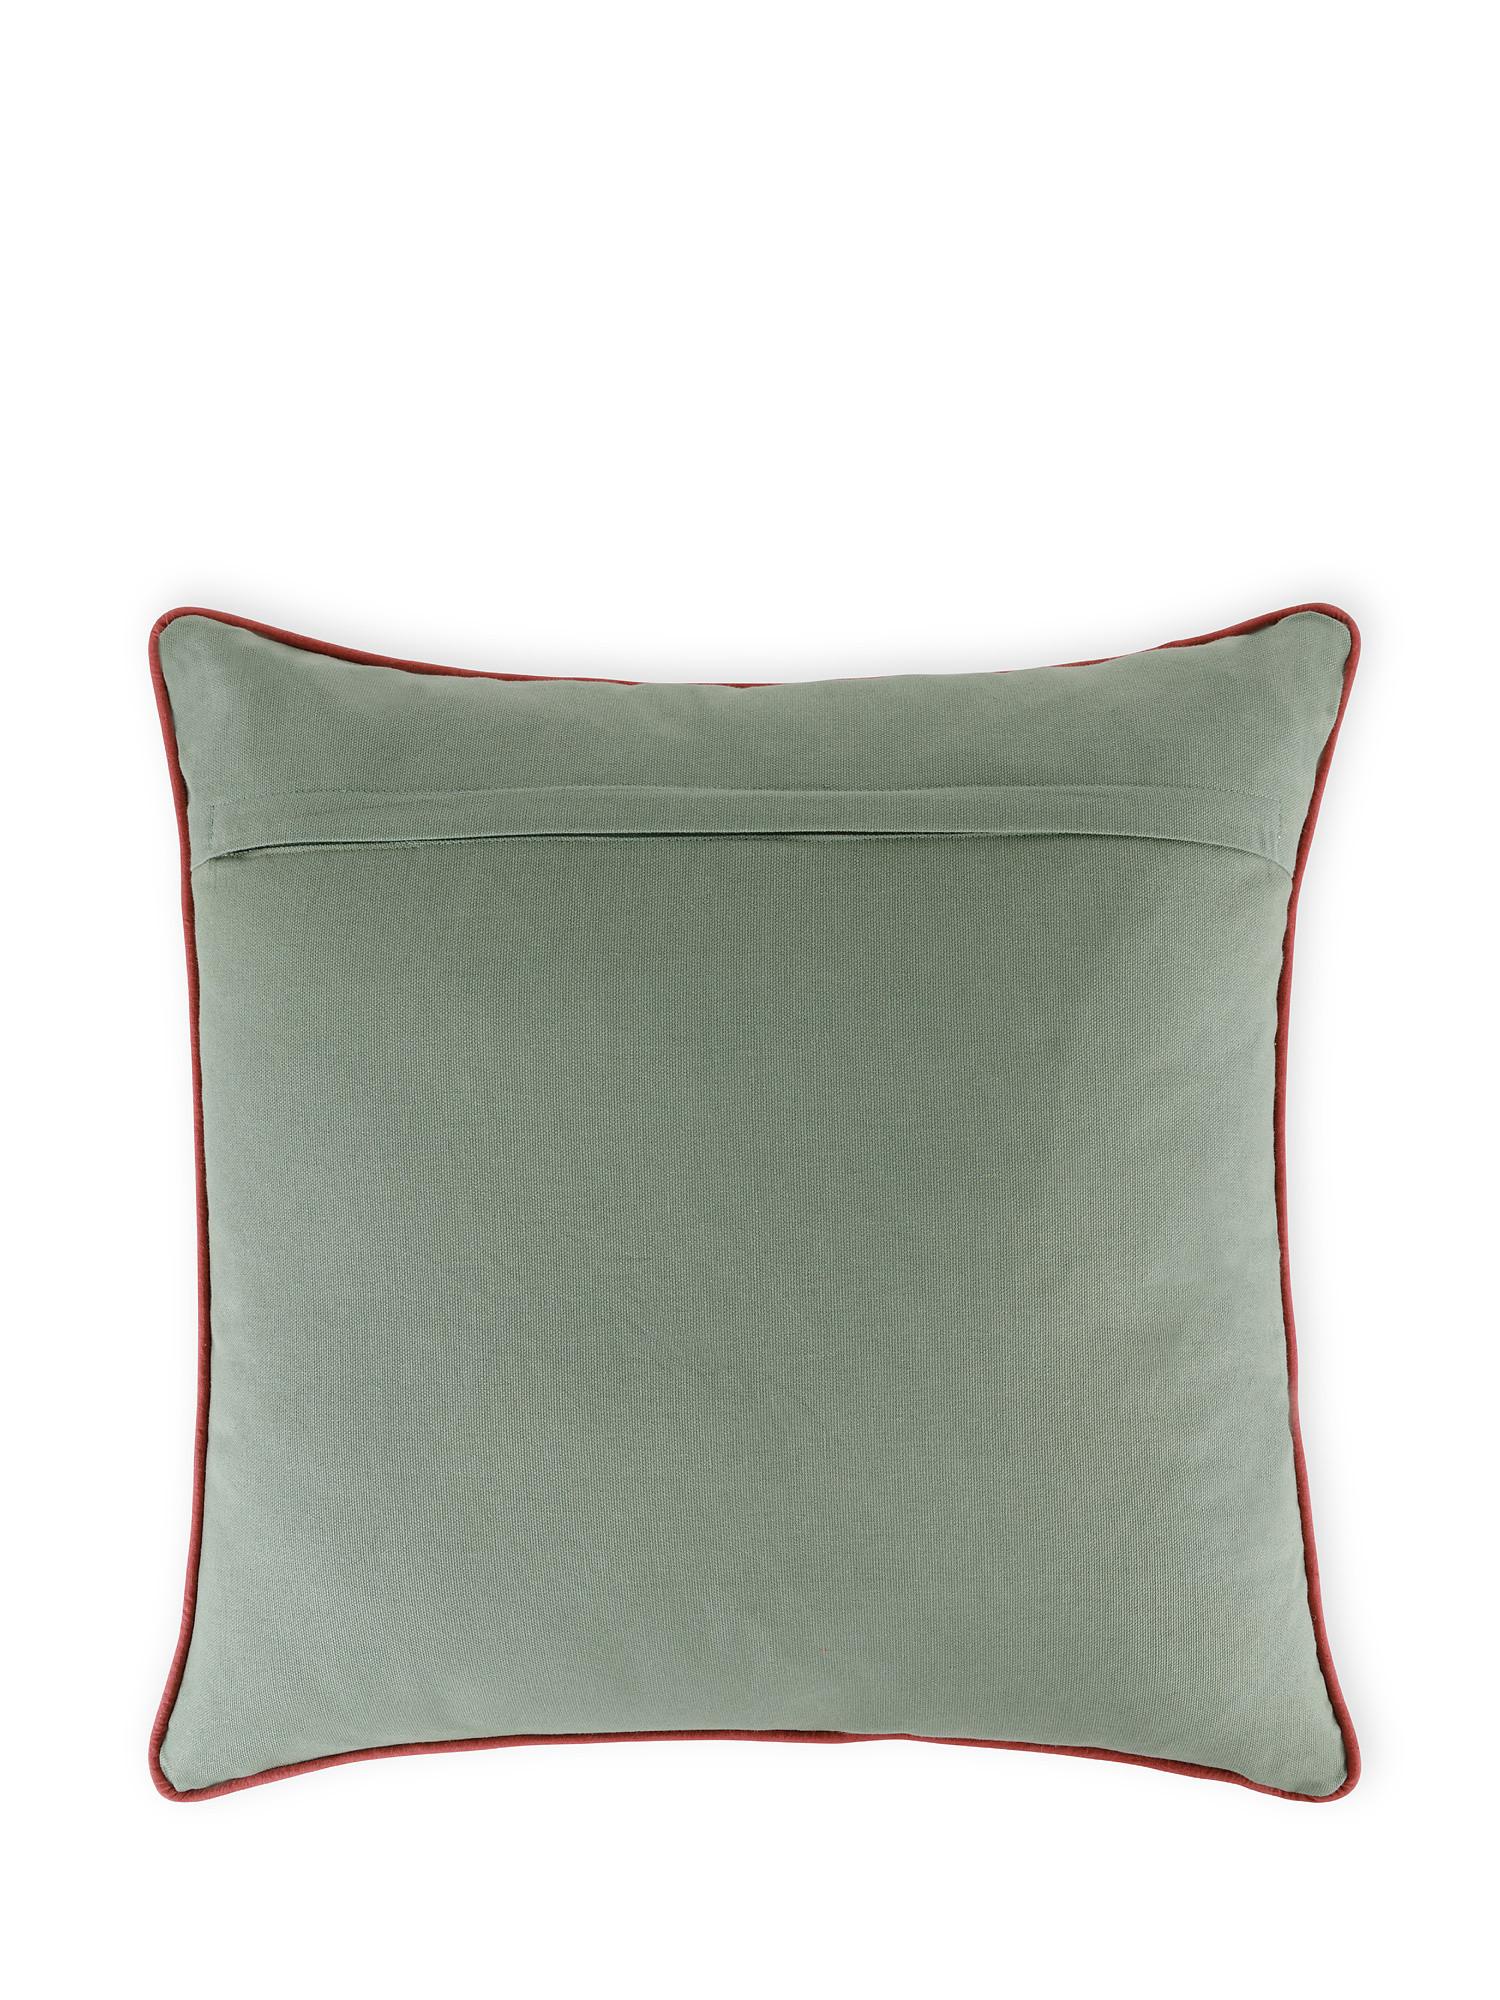 Cuscino cotone ricamo floreale 45x45cm, Multicolor, large image number 1